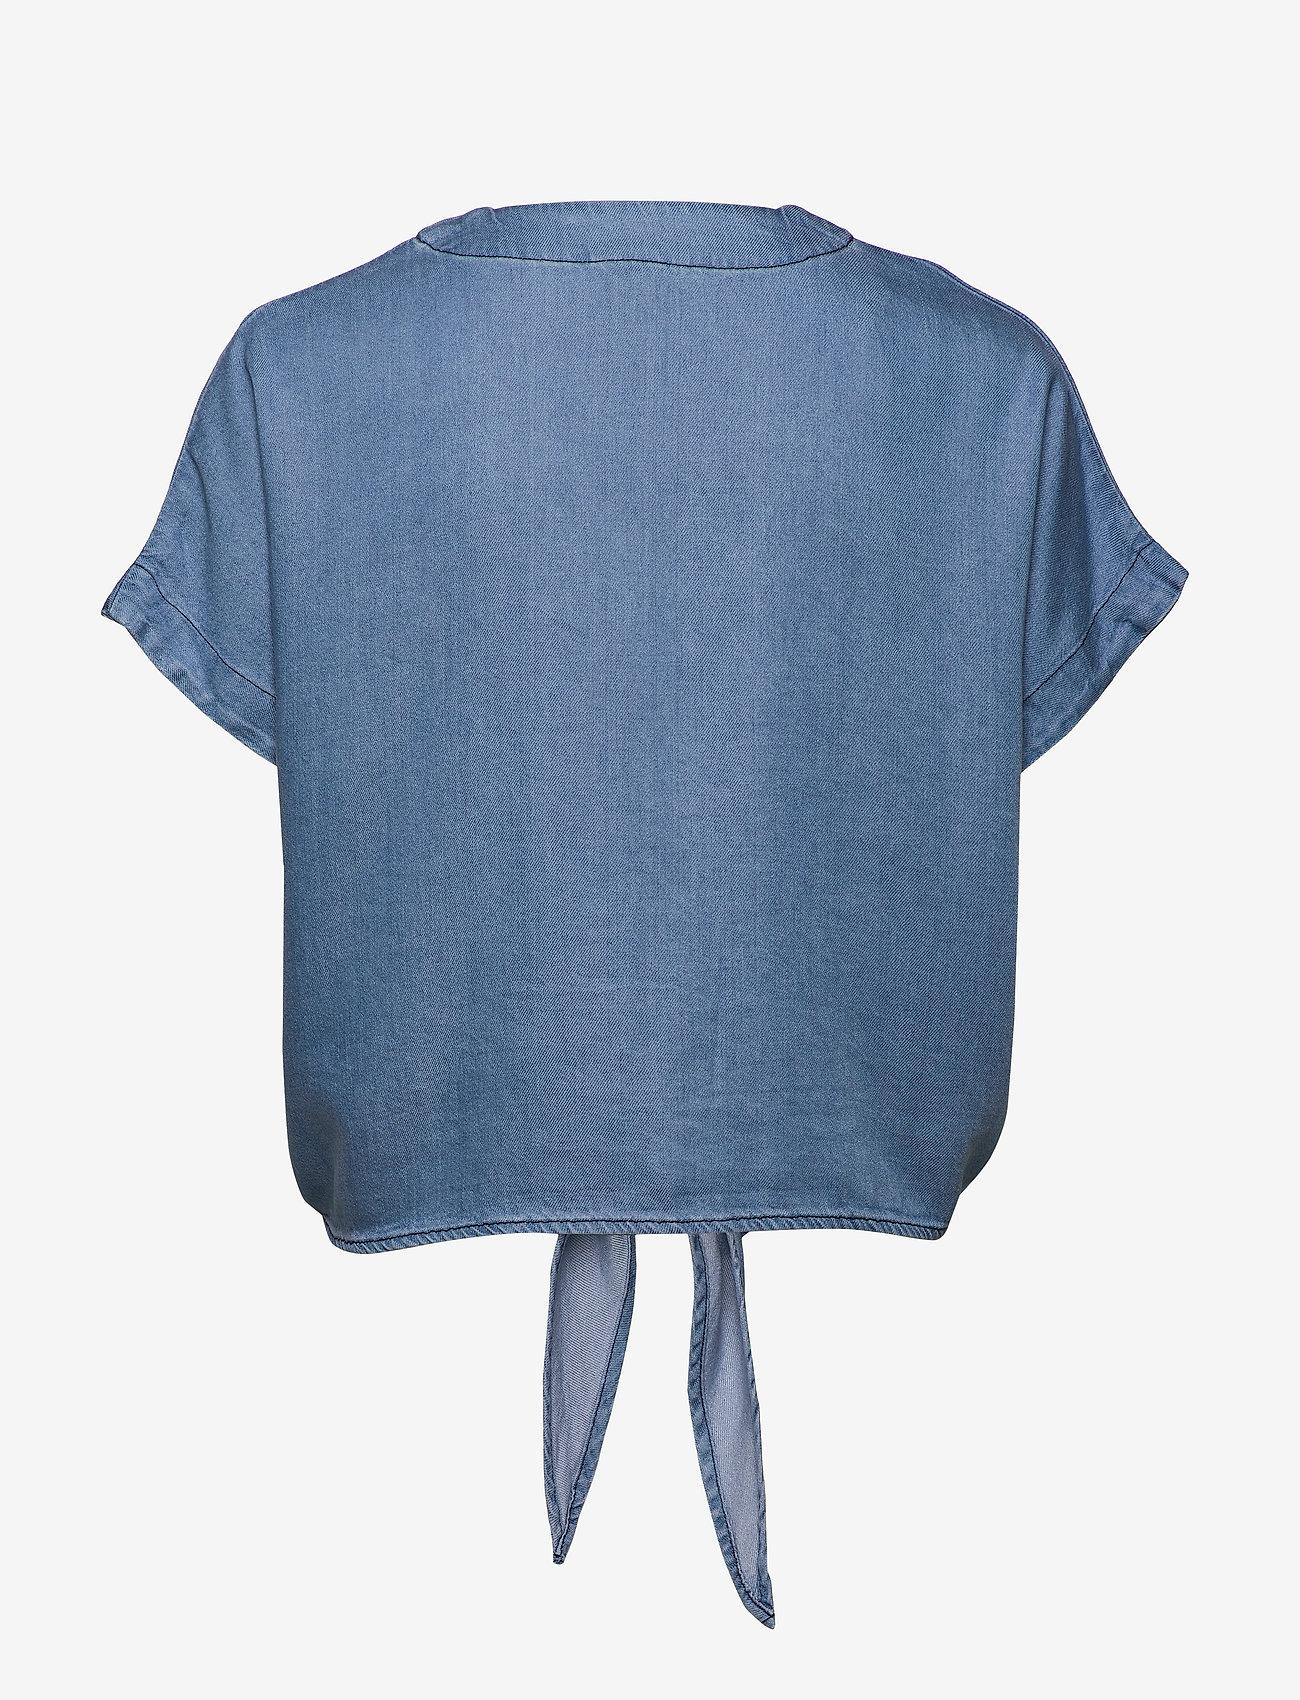 Lindex - Blouse Julia denim - short-sleeved blouses - denim blue - 1